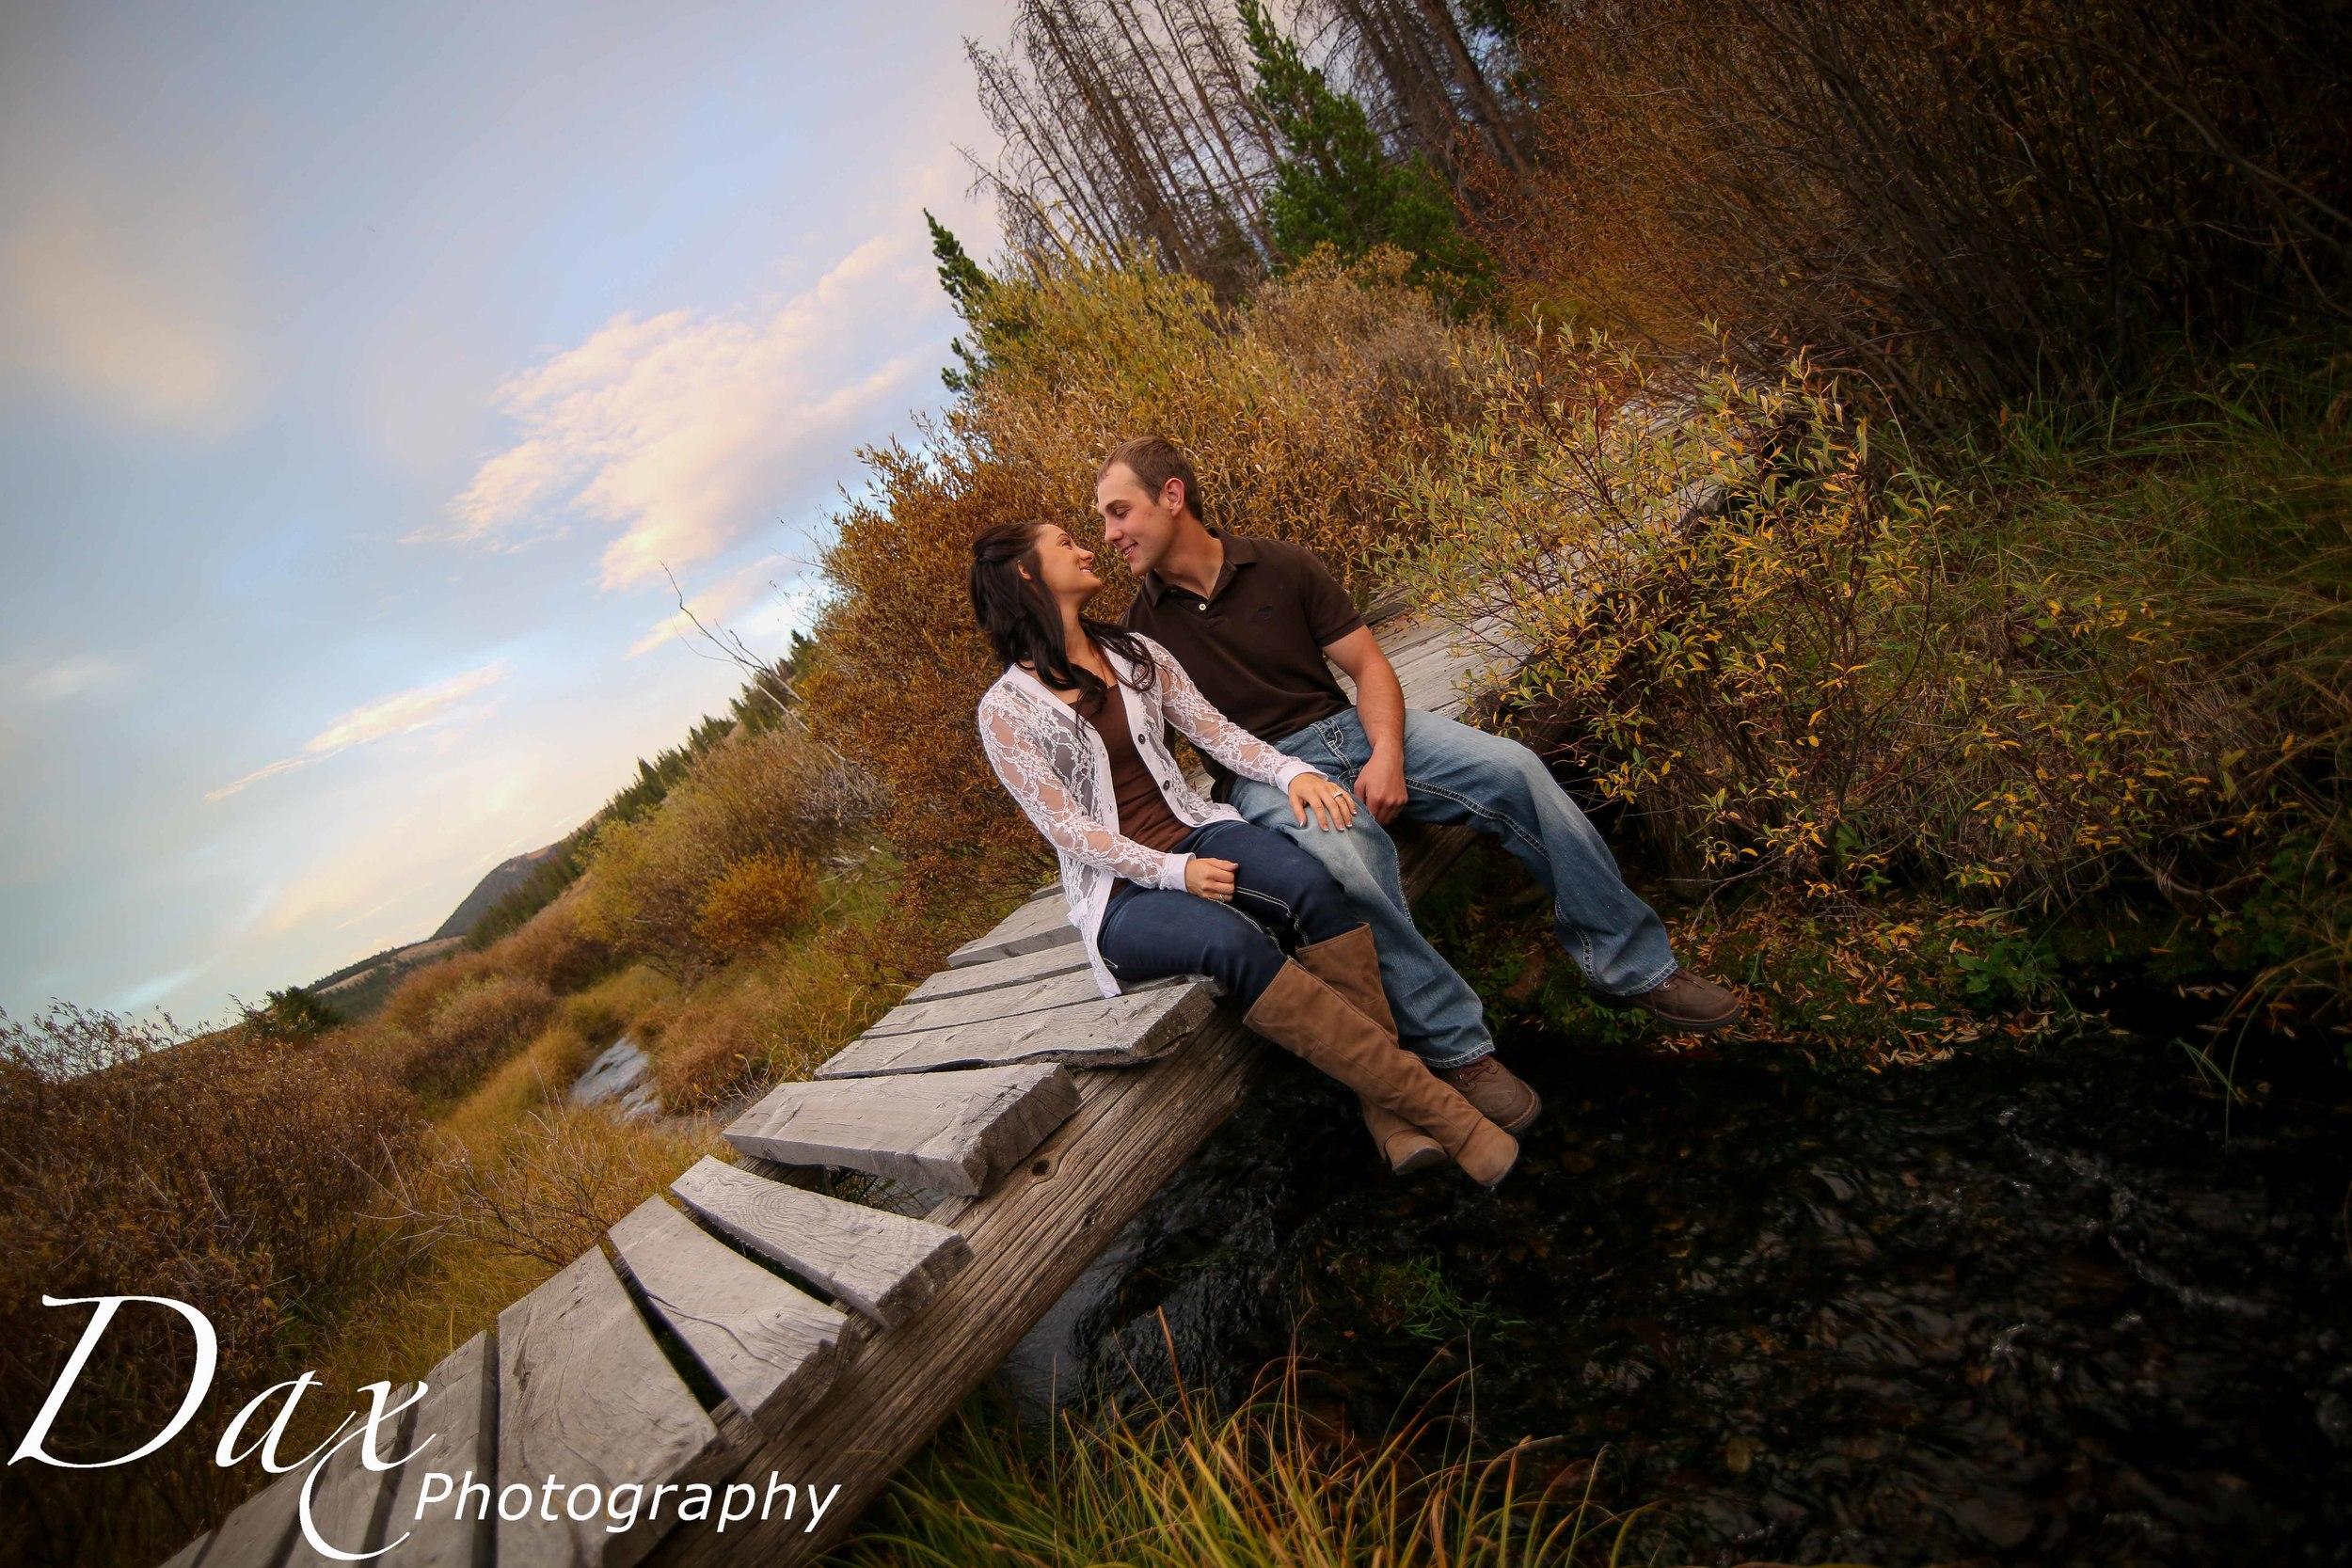 wpid-Montana-photographer-Engagement-Portrait-48801.jpg